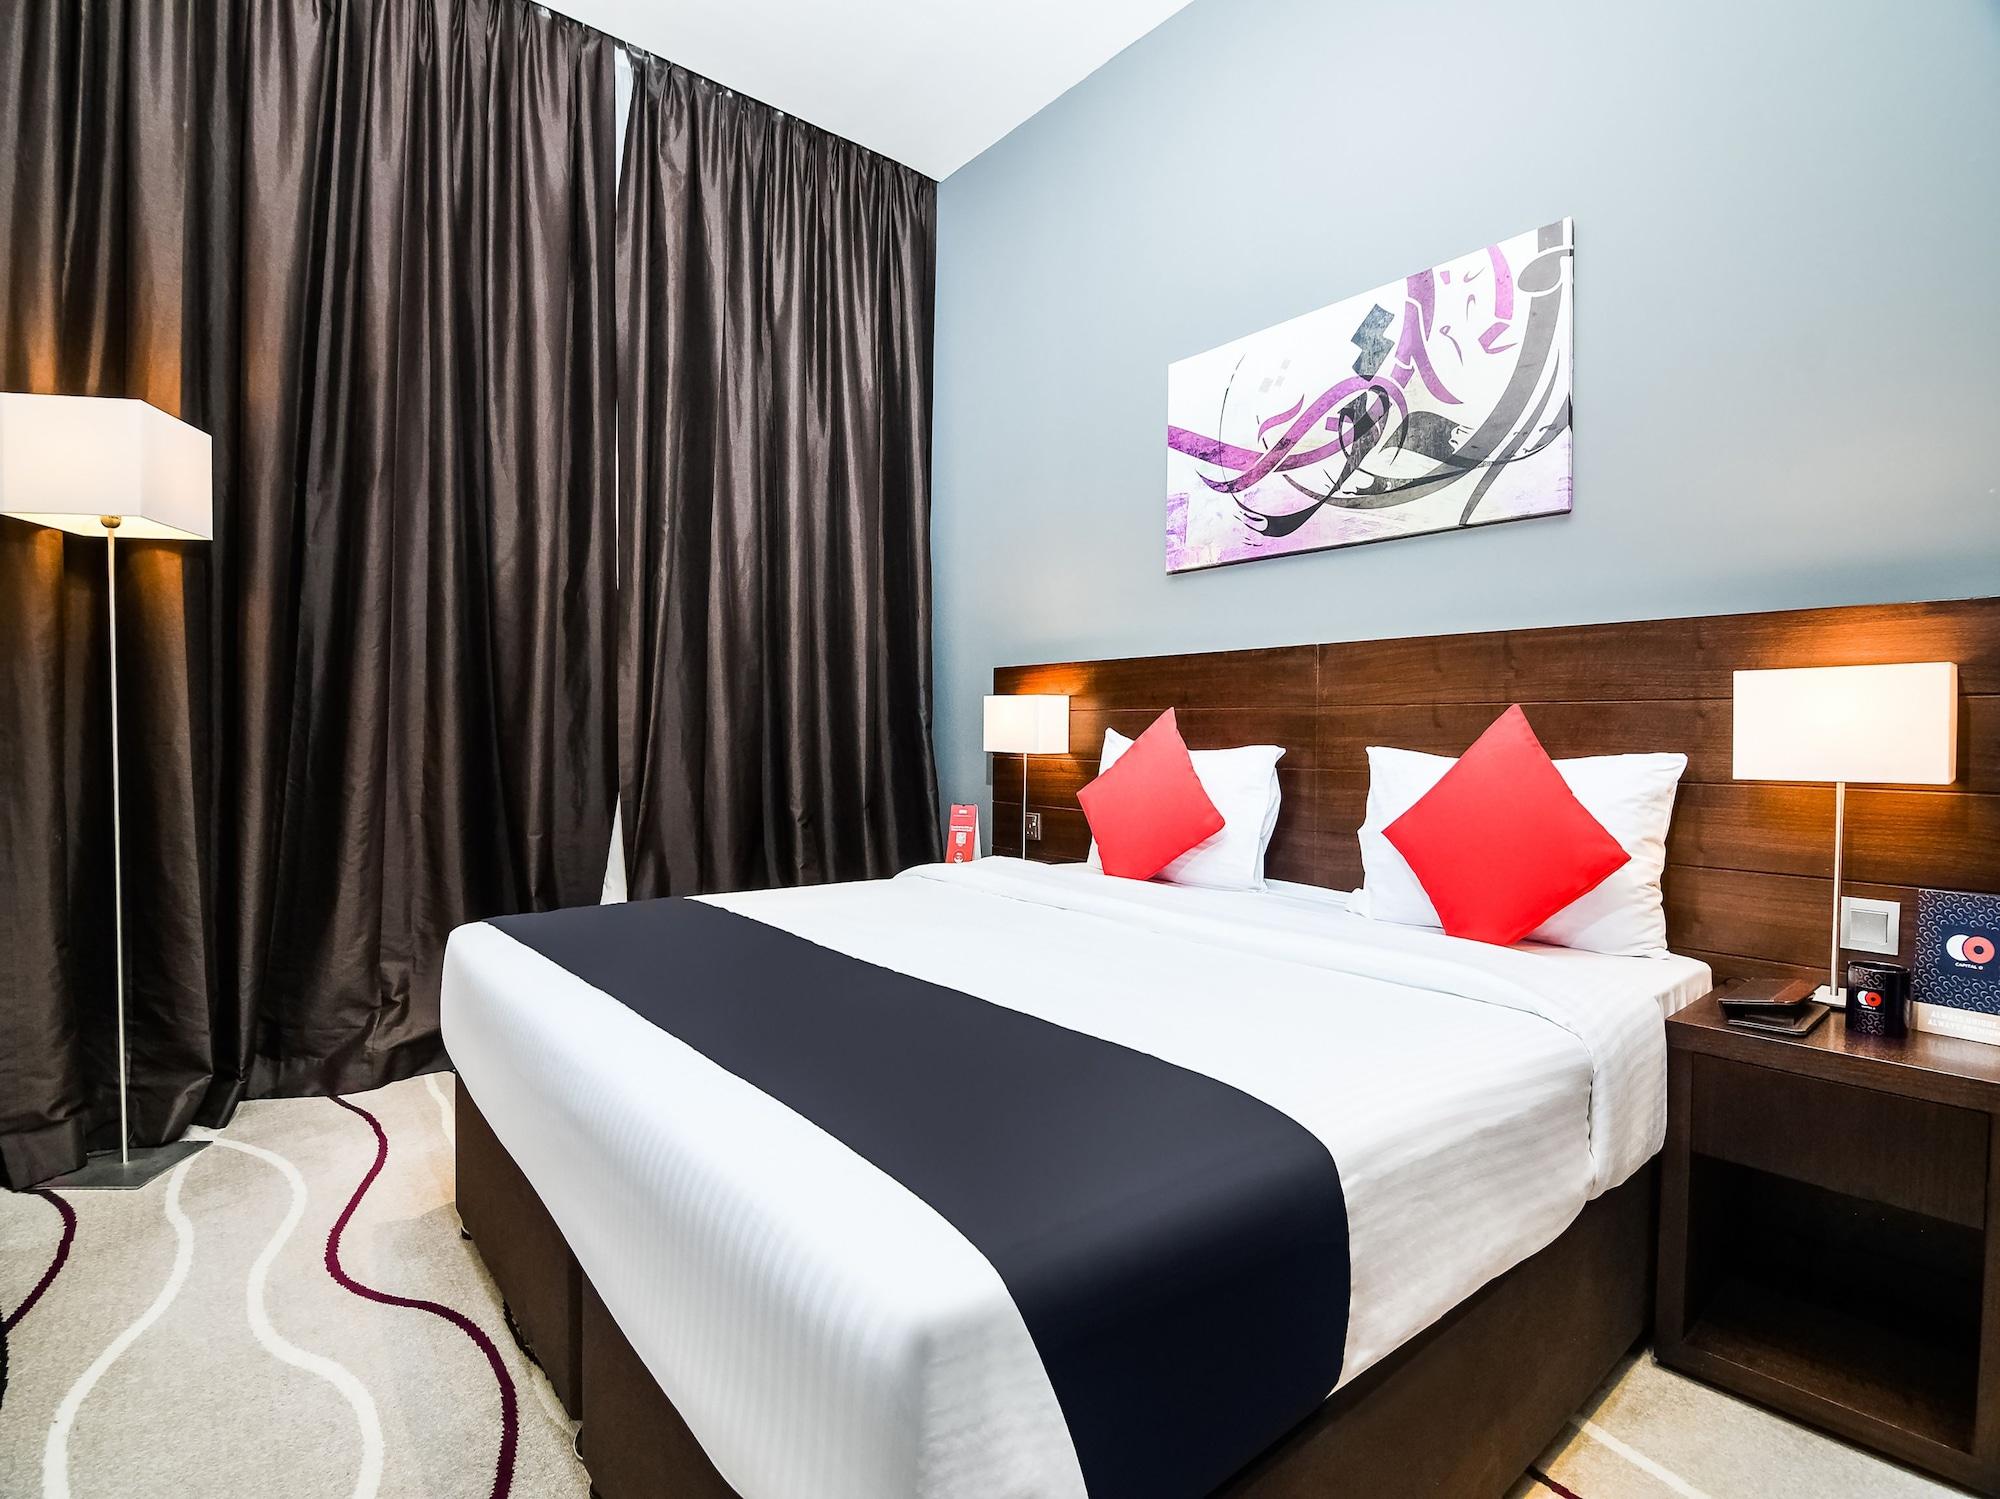 Capital O 187 Action Hotel,